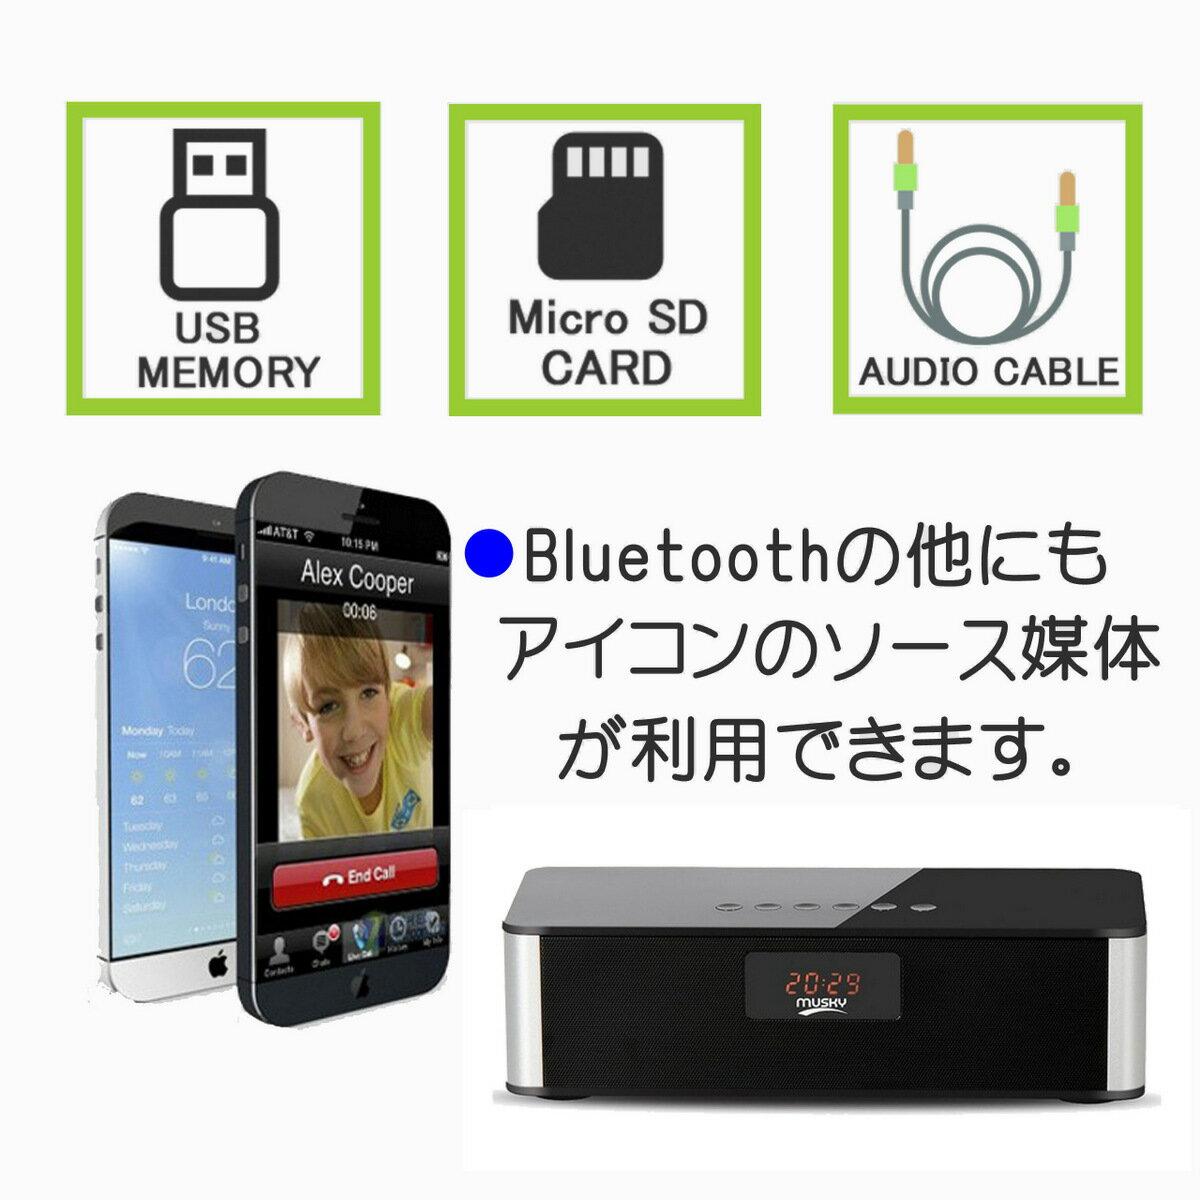 AGM ブルートゥース スピーカー Bluetooth 高音質 高出力 重低音 電話 時計 アラーム 目覚まし FM iphone ipad ipod mini pc スマホ コスパ ステレオ ブラック DY21L